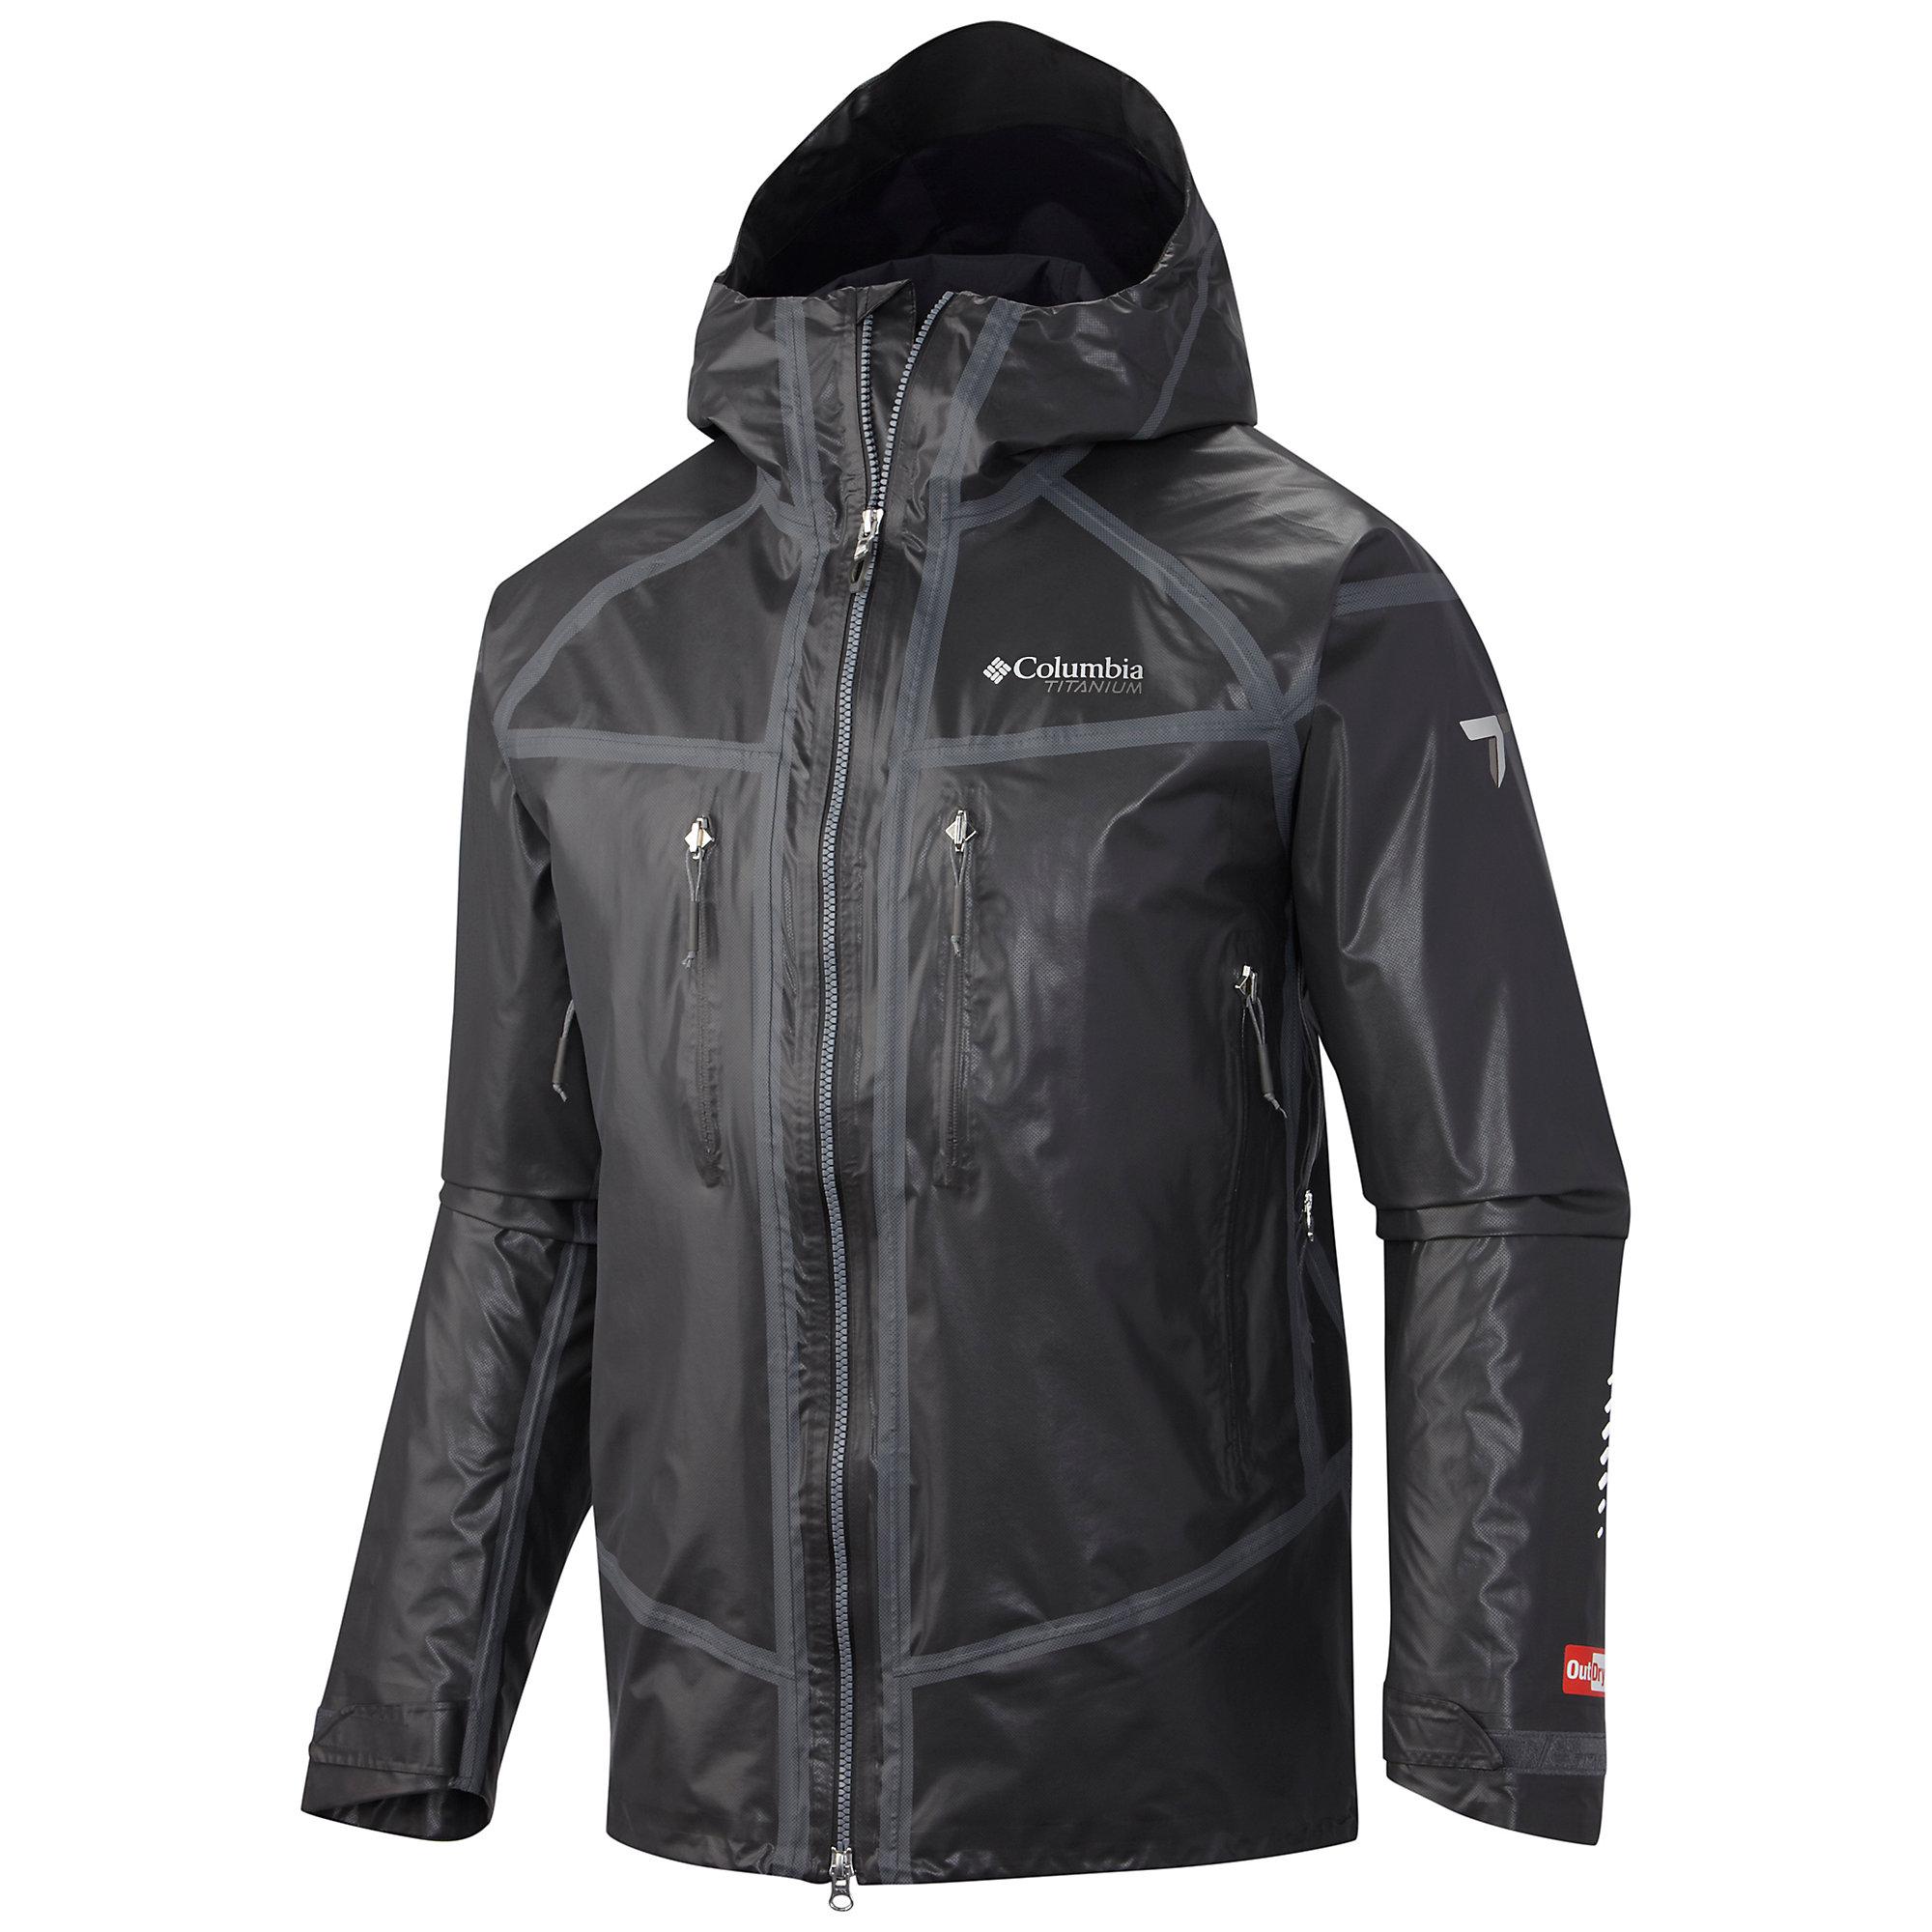 Columbia OutDry Ex Platinum Tech Shell Jacket